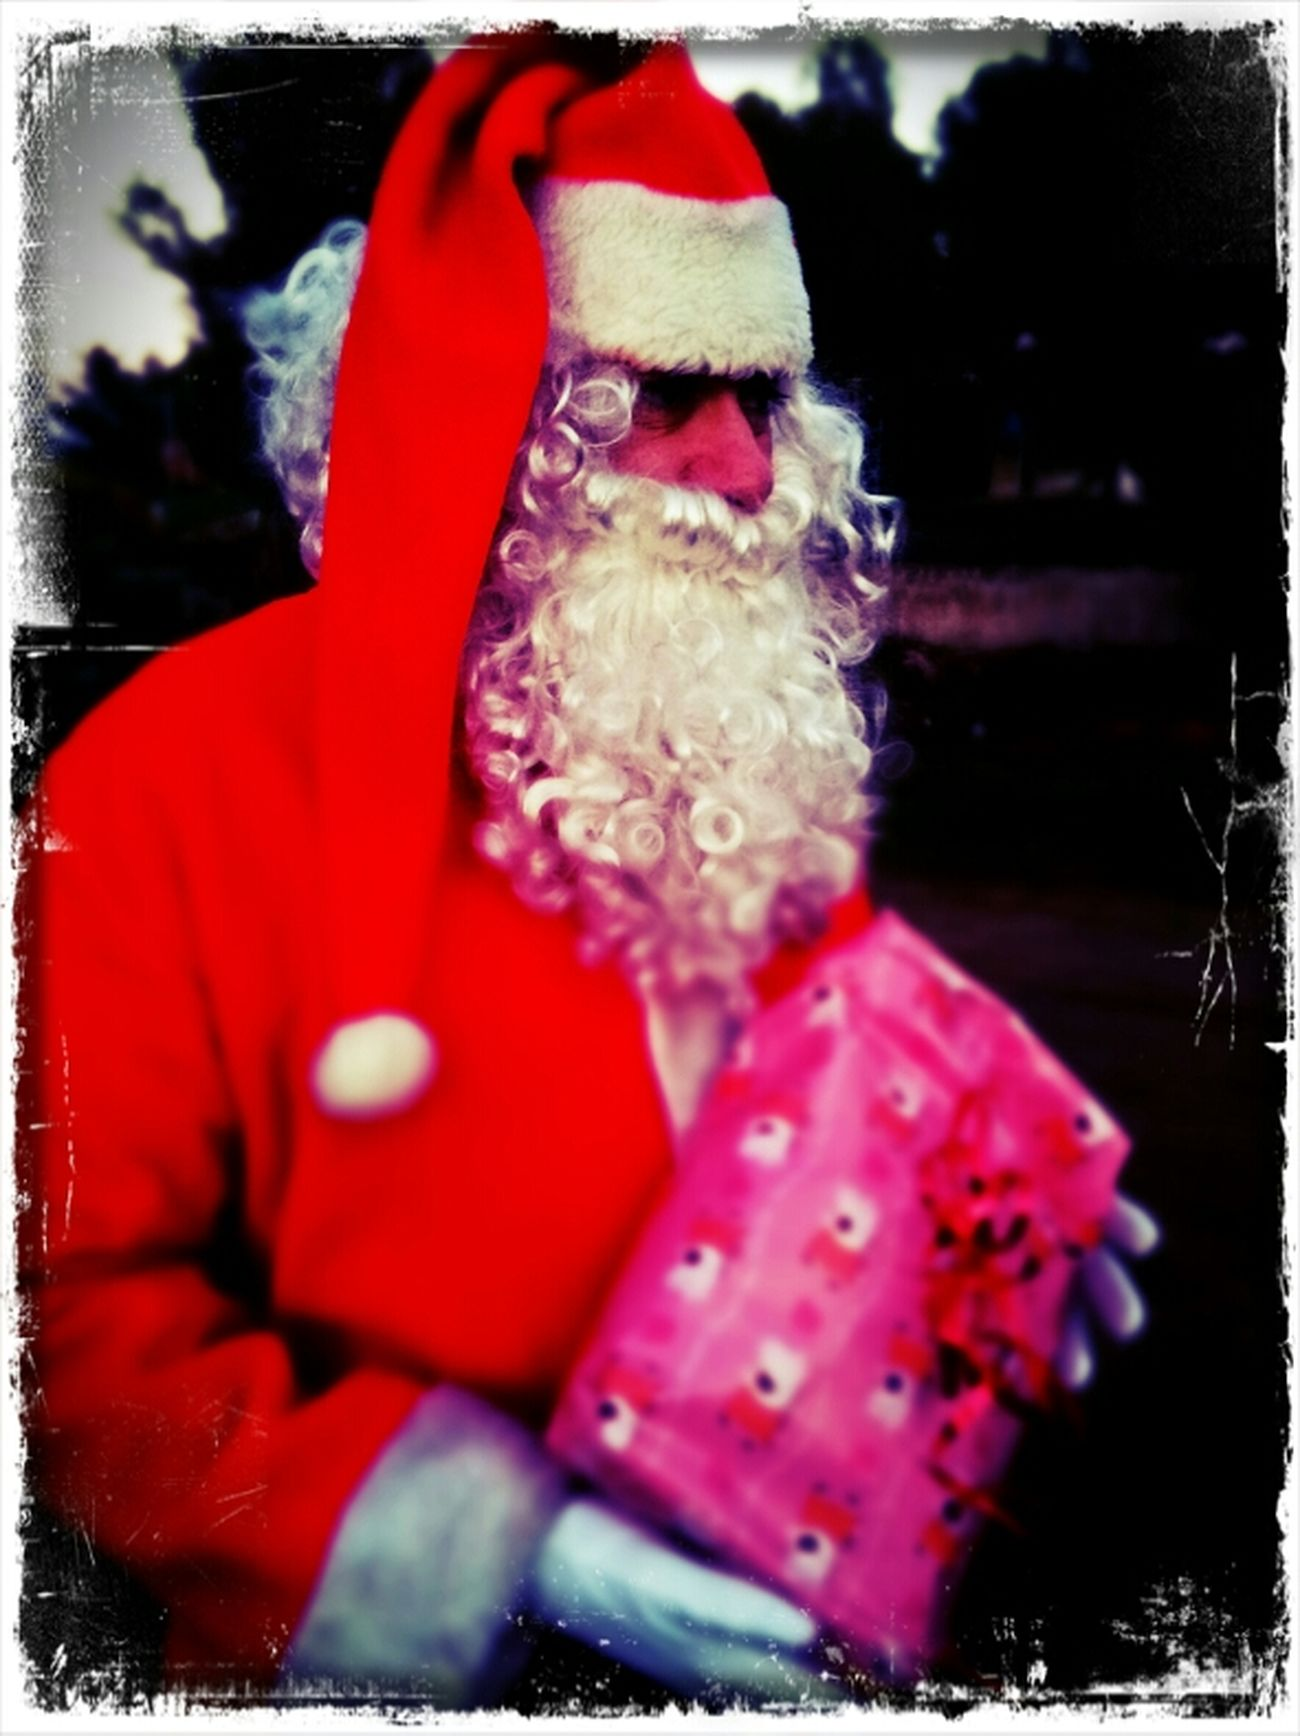 Christmas Xmas Navidad Santa Claus Pare Nadal